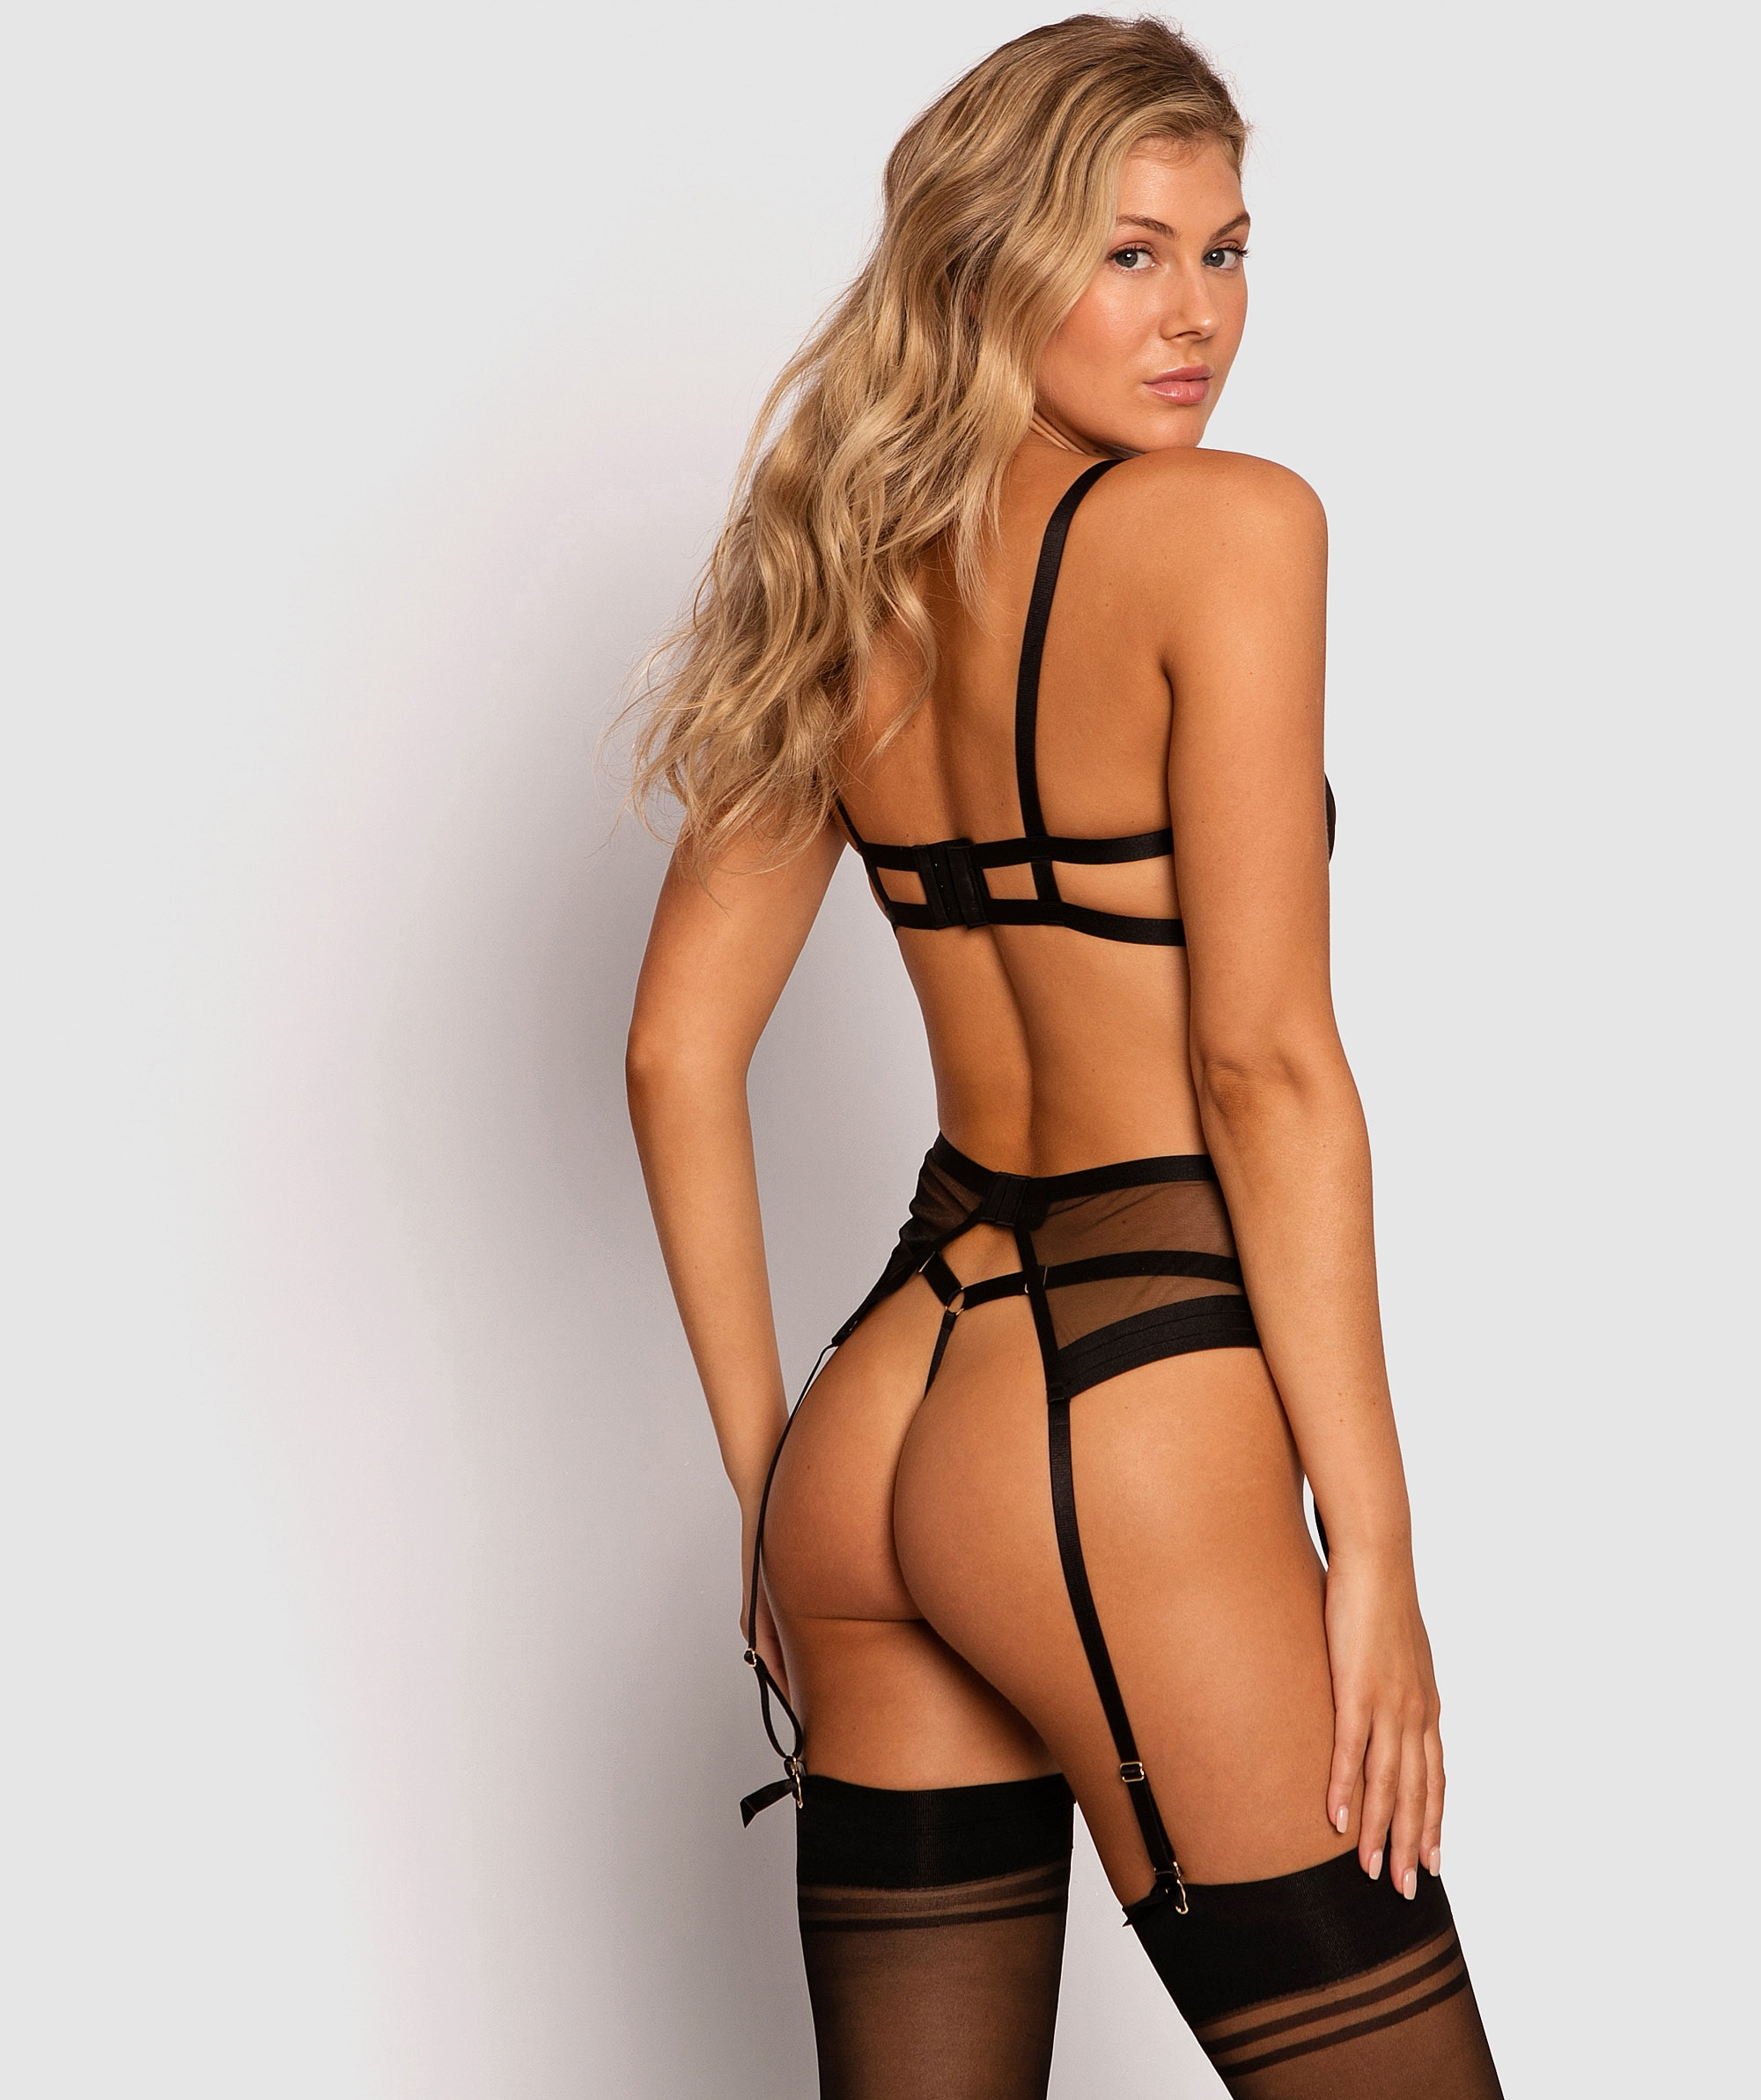 Temptation Suspender  - Black